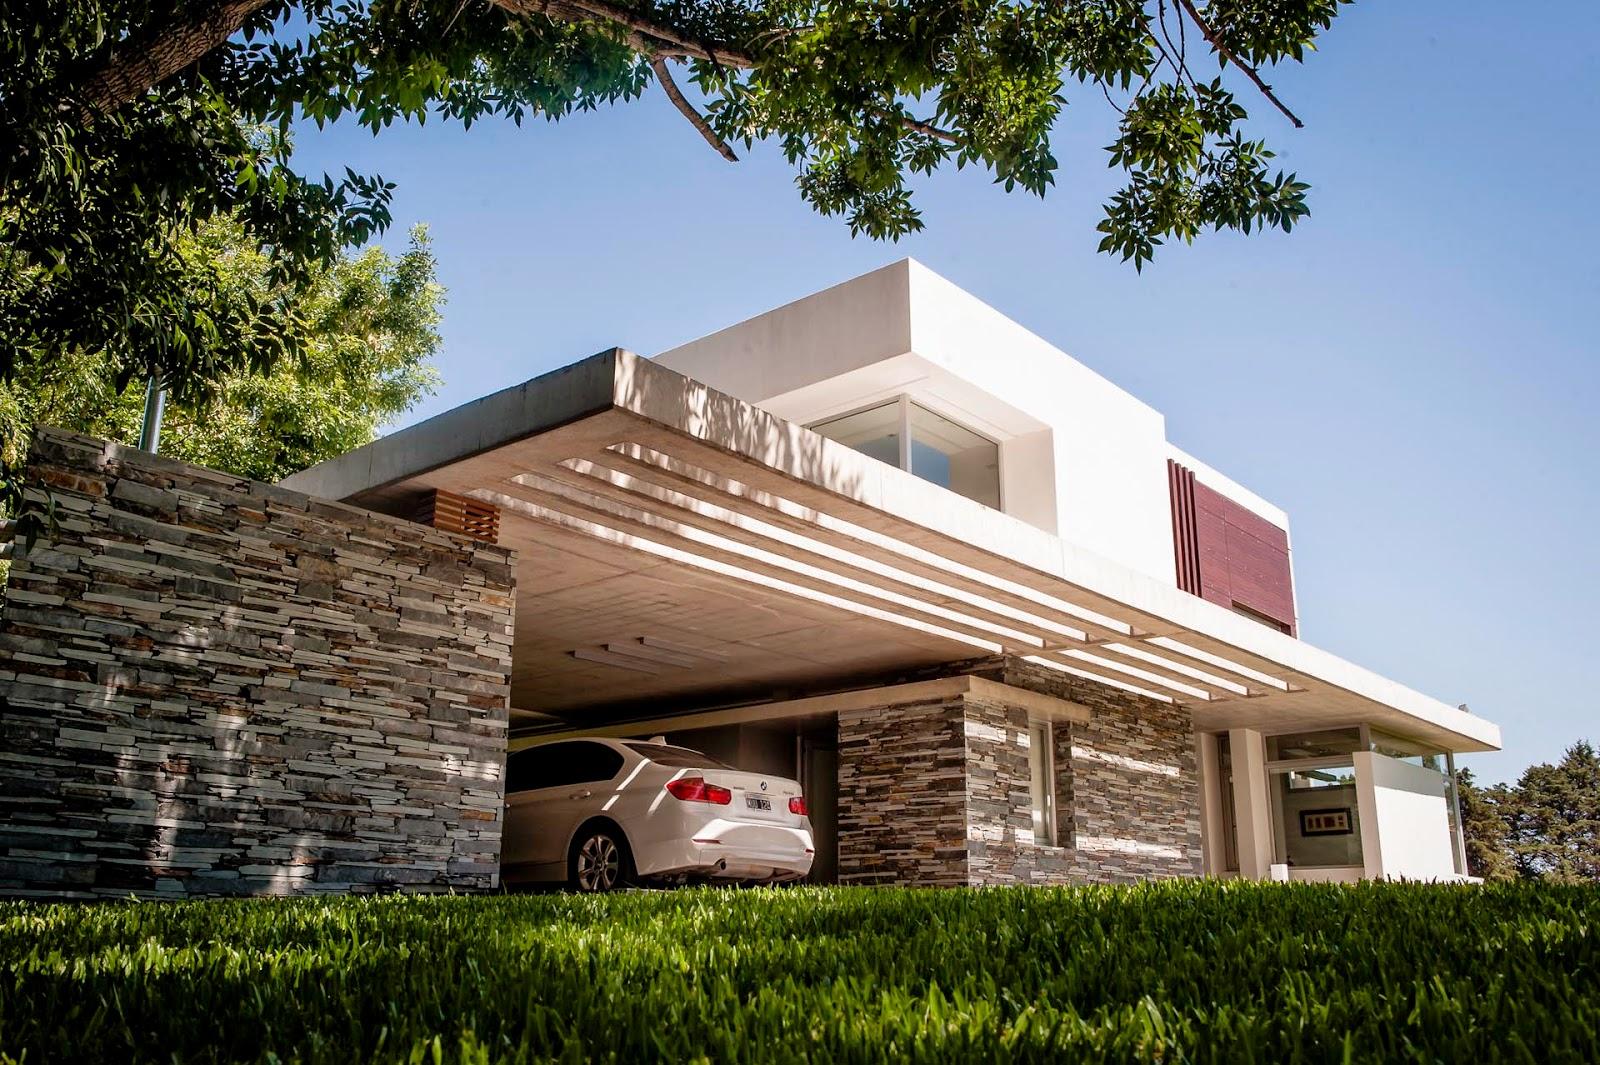 Casa en city bell arquitectura en estado purotop webs de for Arquitectura casa